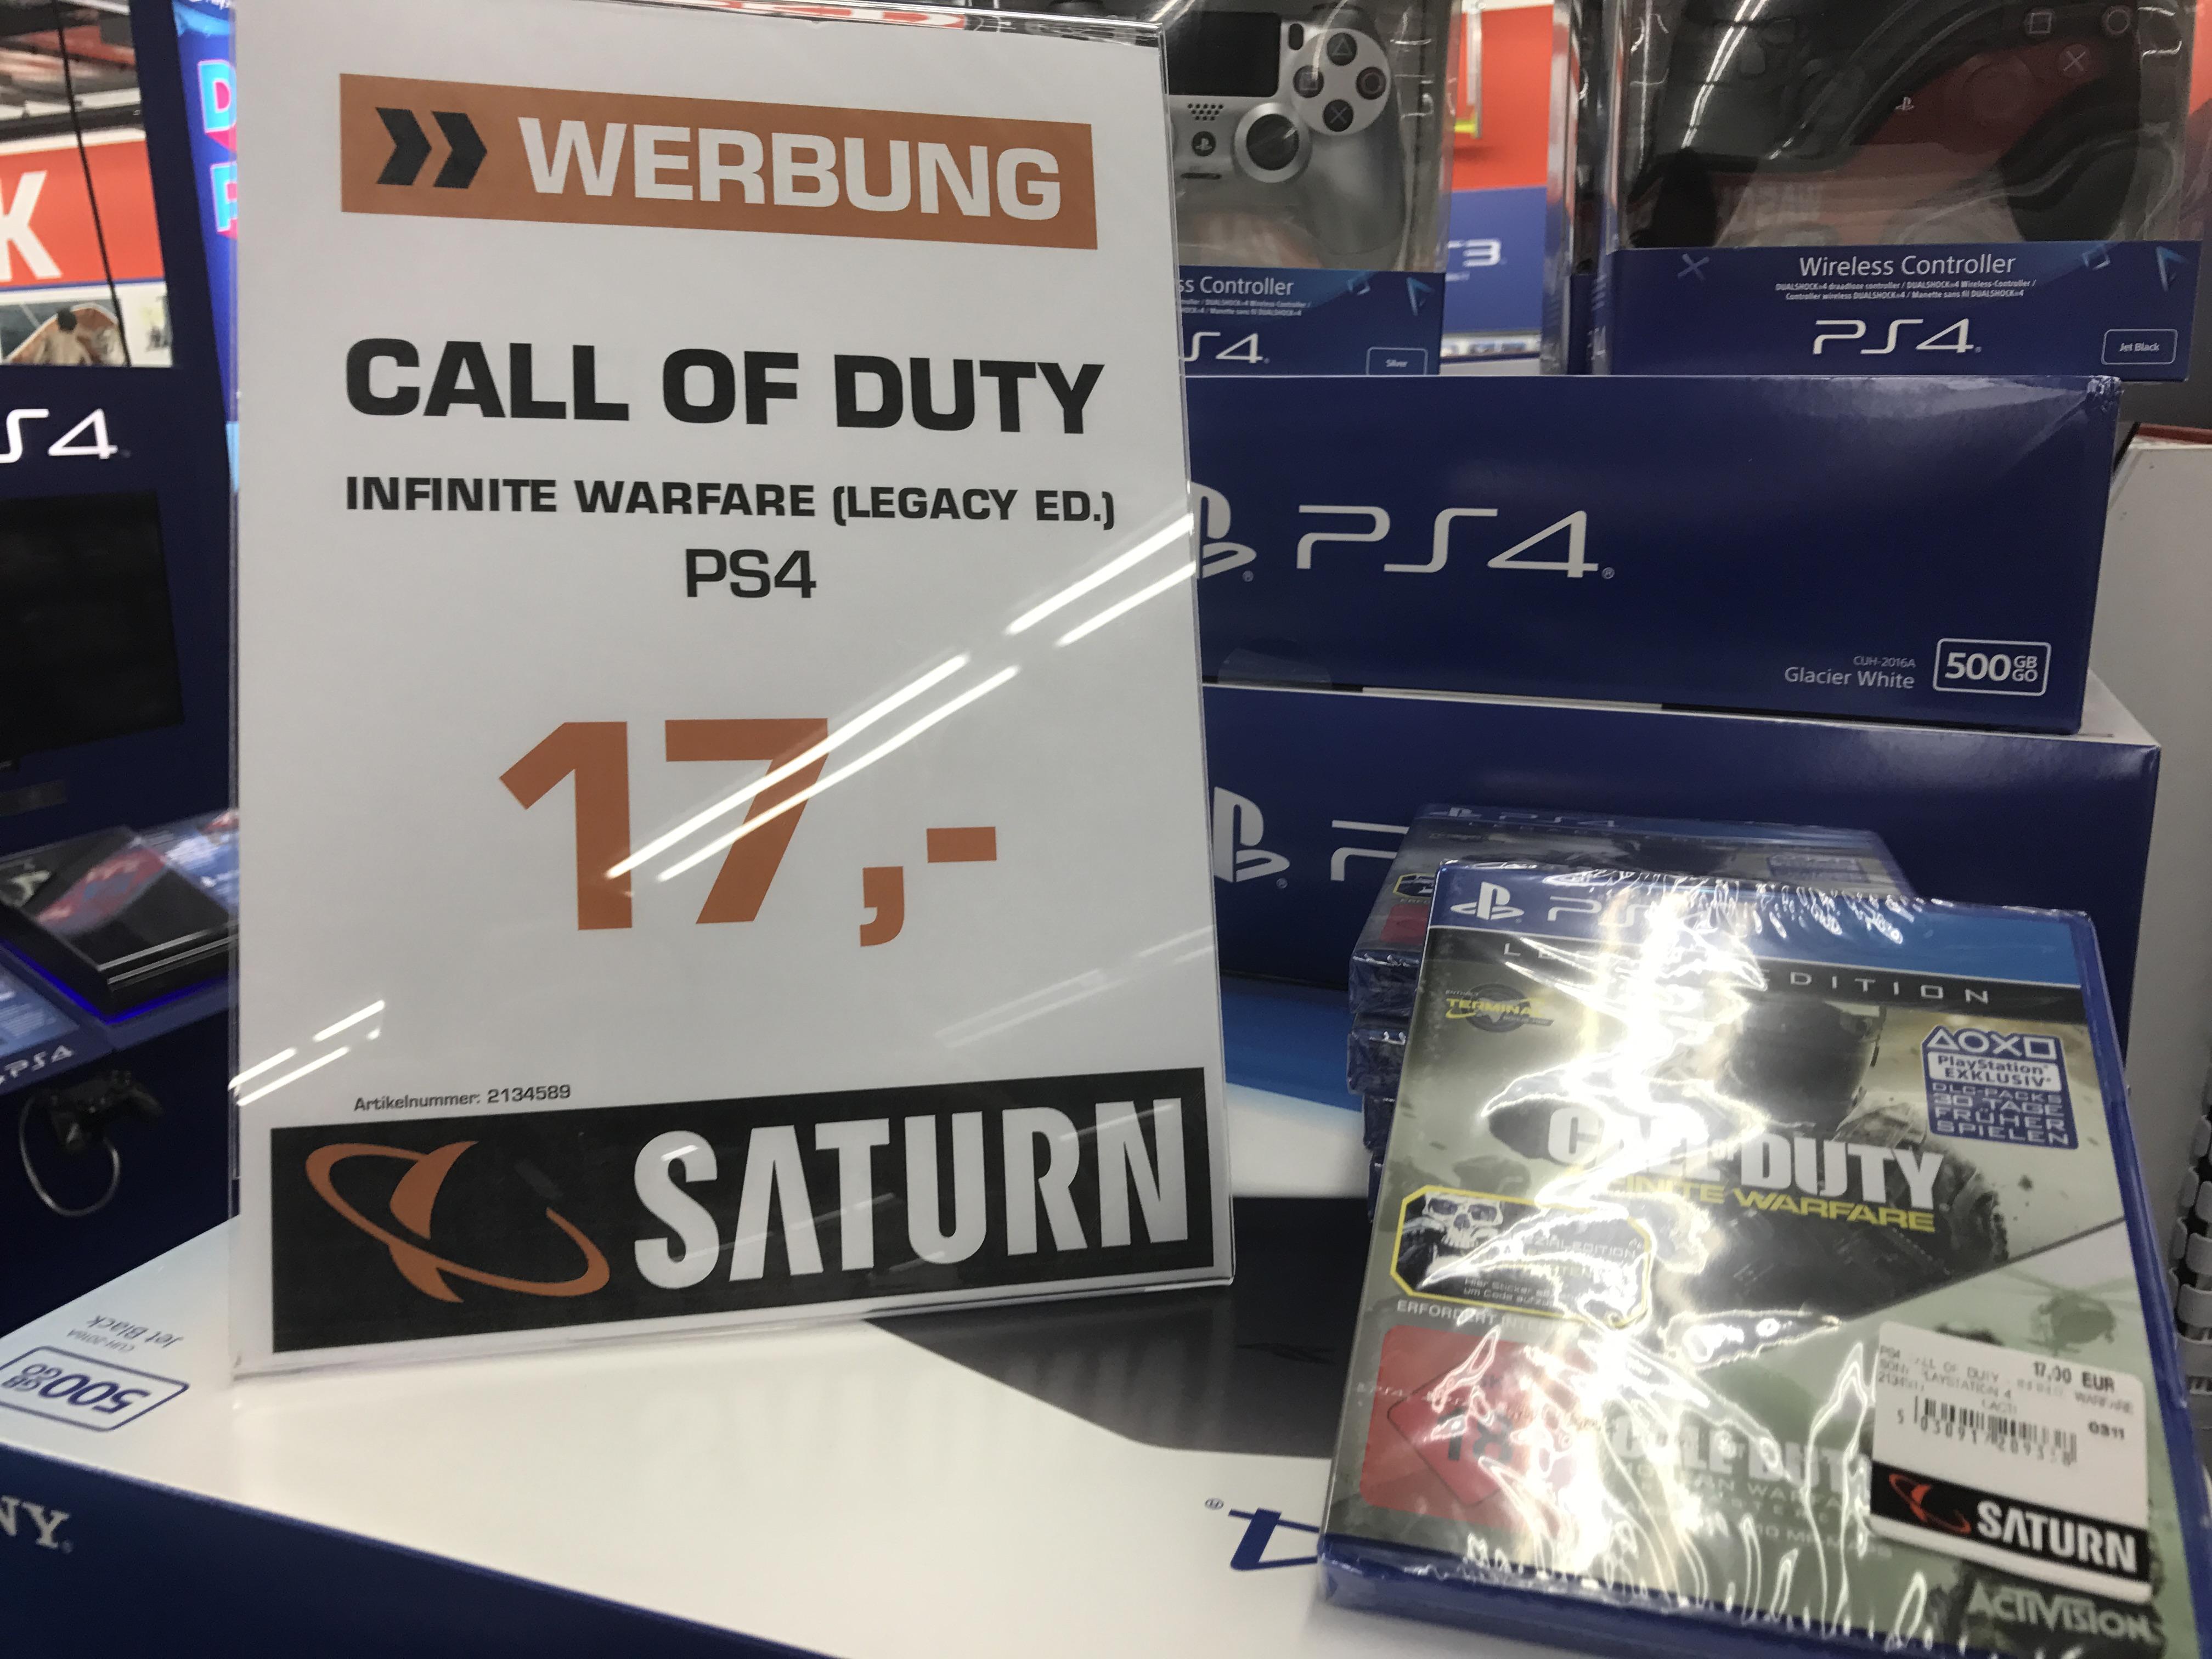 [lokal] Saturn Hennef: PS4 Call of Duty®: Infinite Warfare (Legacy Edition) für 17€